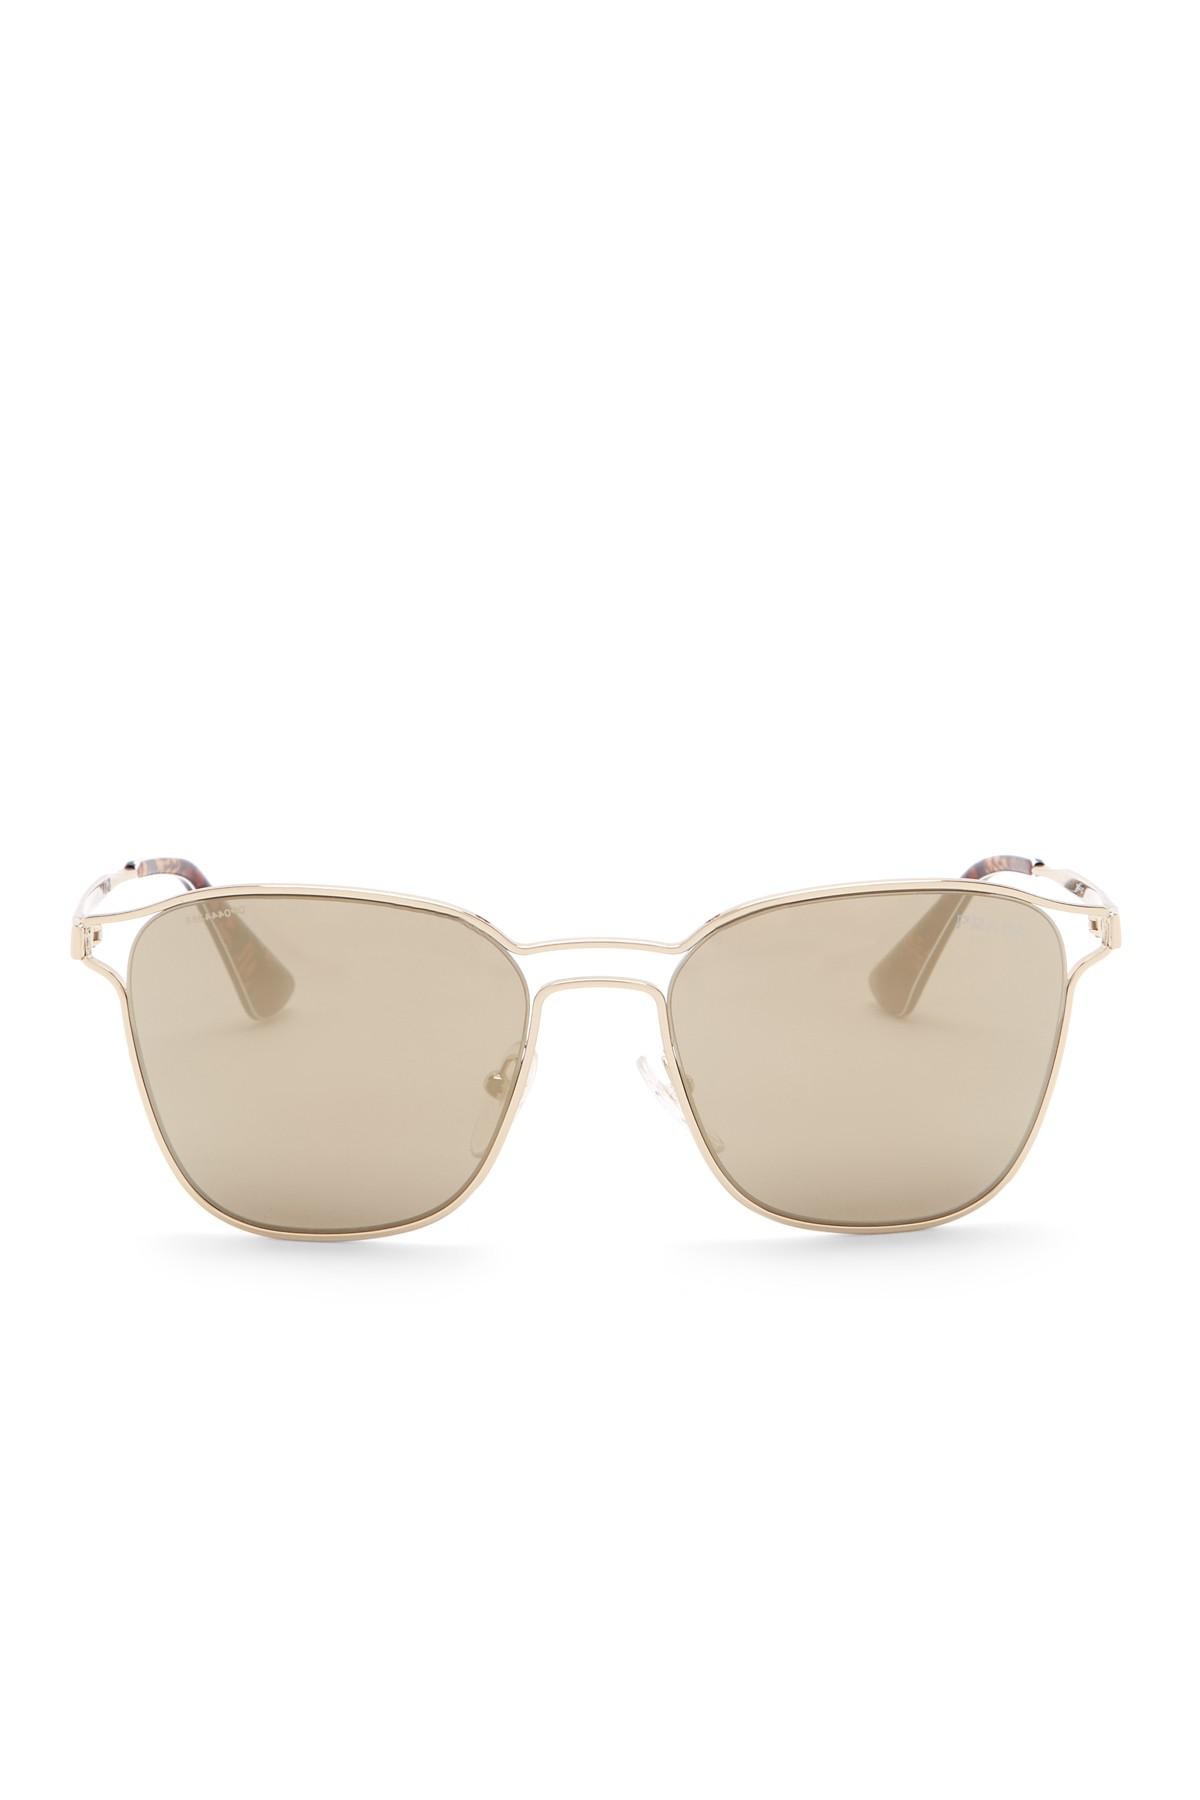 b2b55bcf41b0 ... coupon code prada metallic 55mm square sunglasses lyst. view fullscreen  d9835 6f919